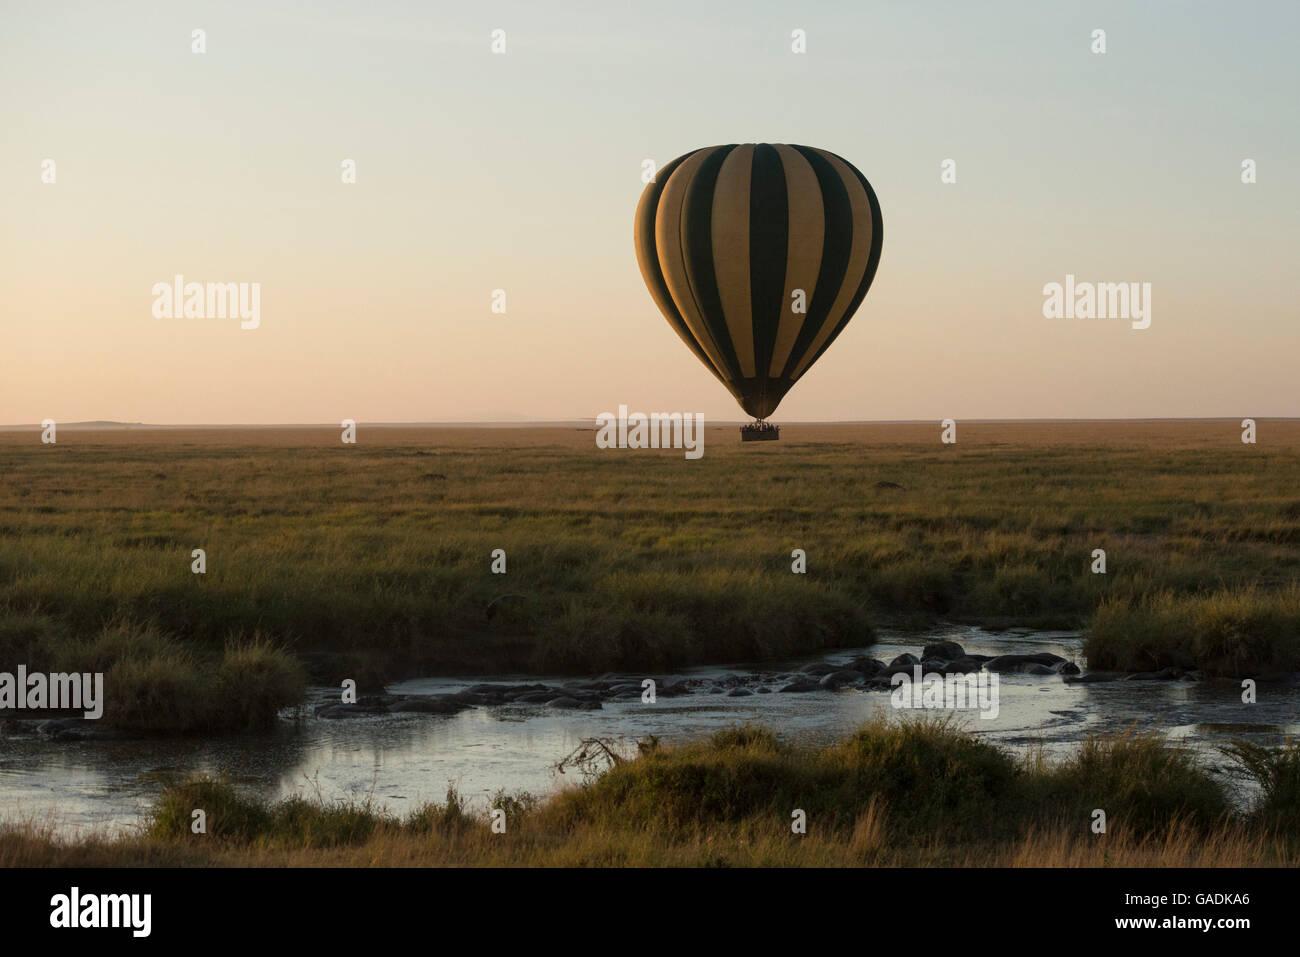 Balloon safari, Serengeti National Park, Tanzania - Stock Image